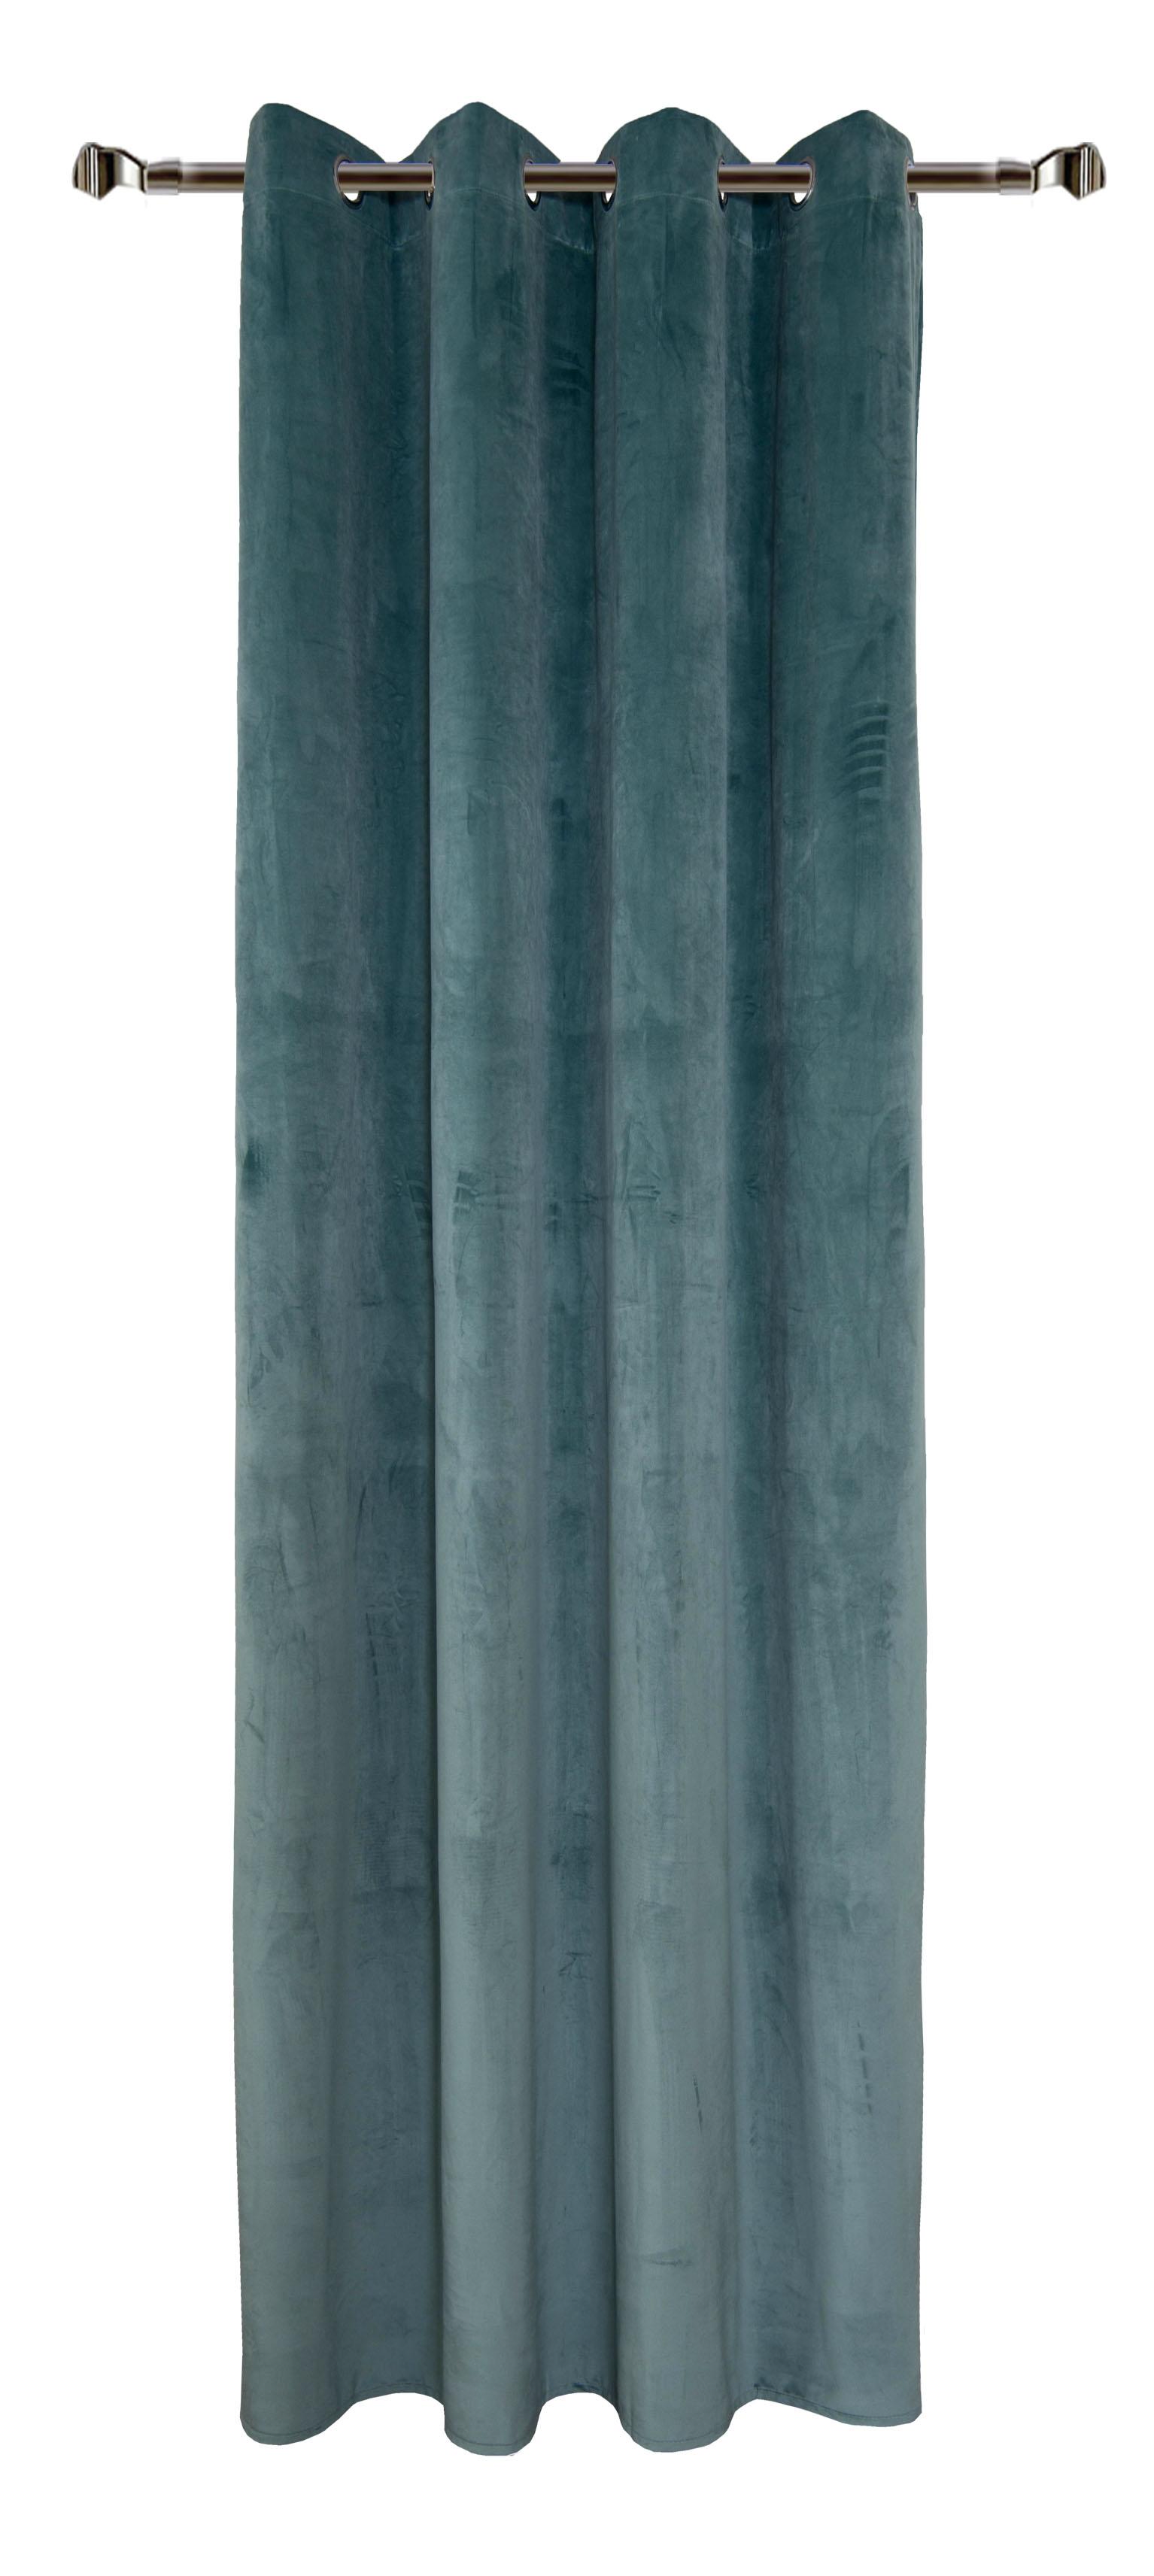 Draperie Home RM-MJ11-62 Light Green 140 x 270 cm 1 bucata